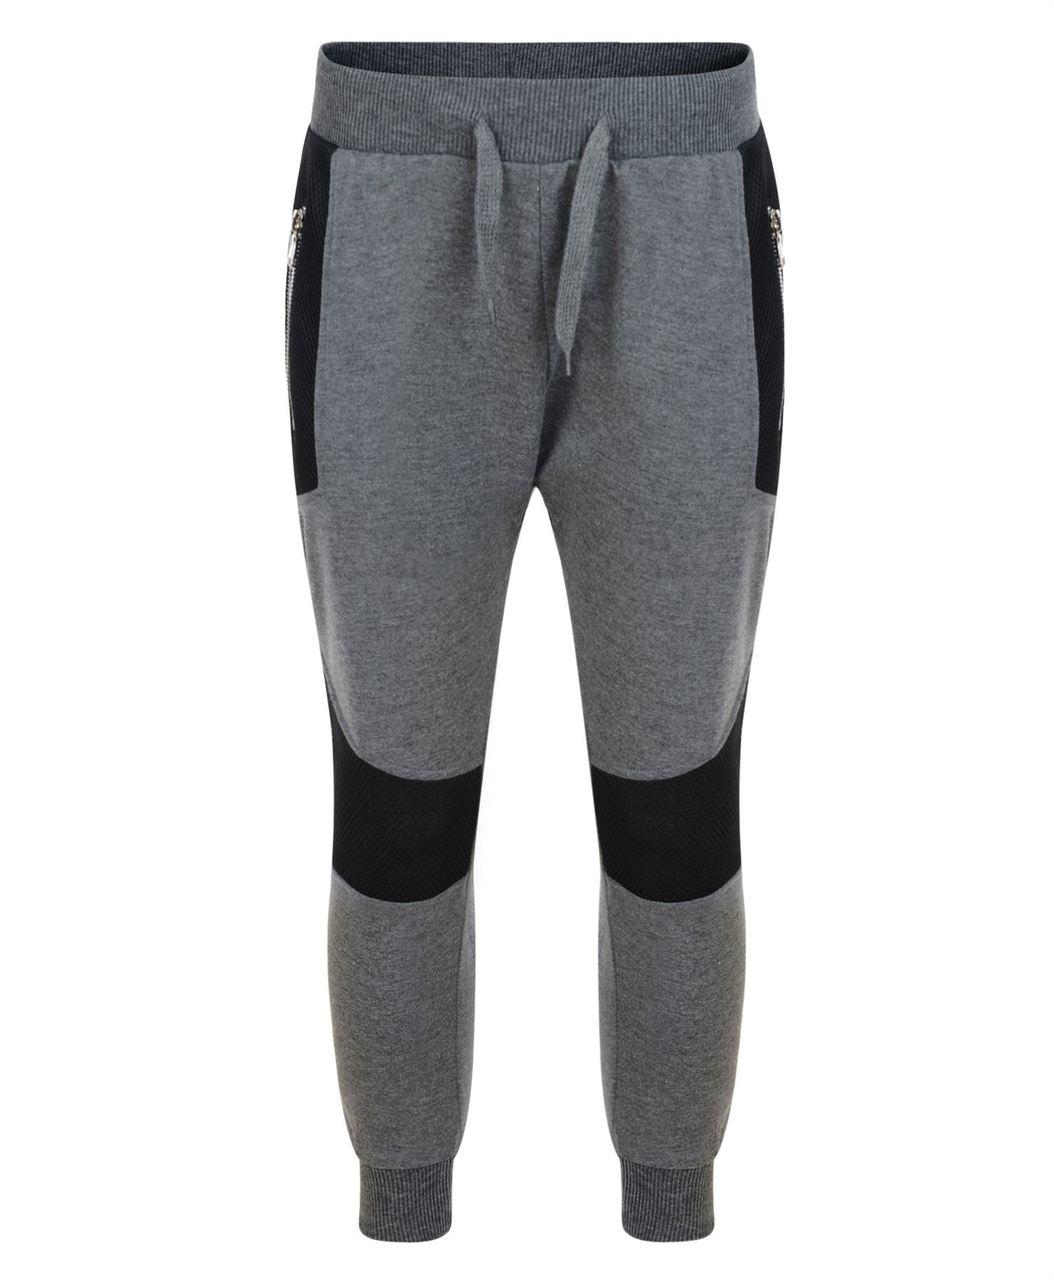 Girls Boys Drop Crotch Bottoms Casual Jogging Pants Kids Sweatpants 3-14 Years